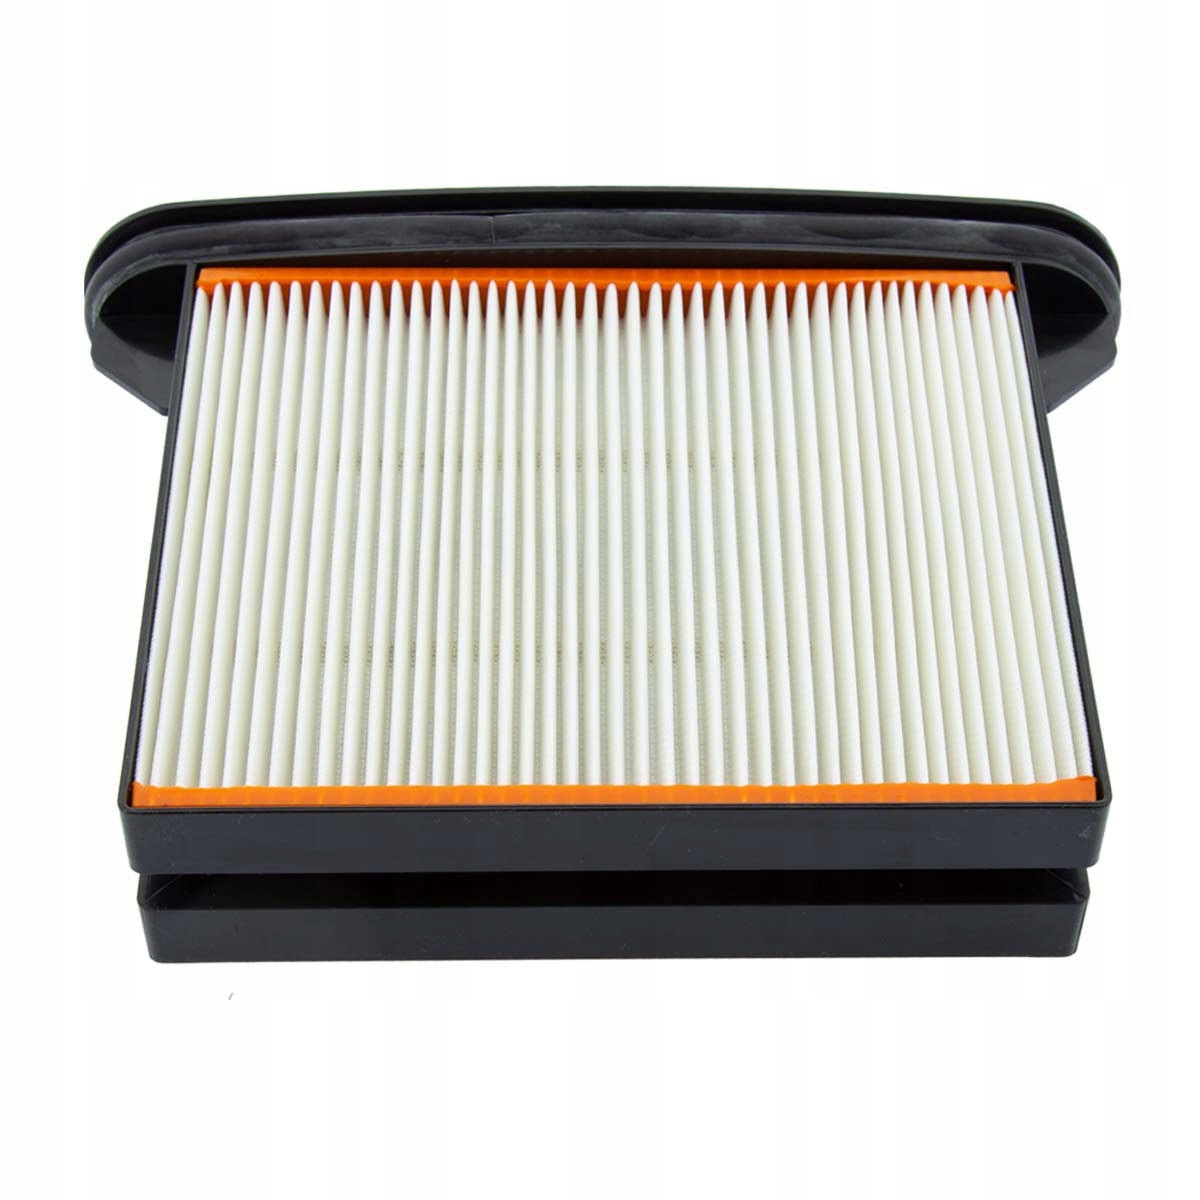 Filter do vysávača STARMIX IS ARD-1225